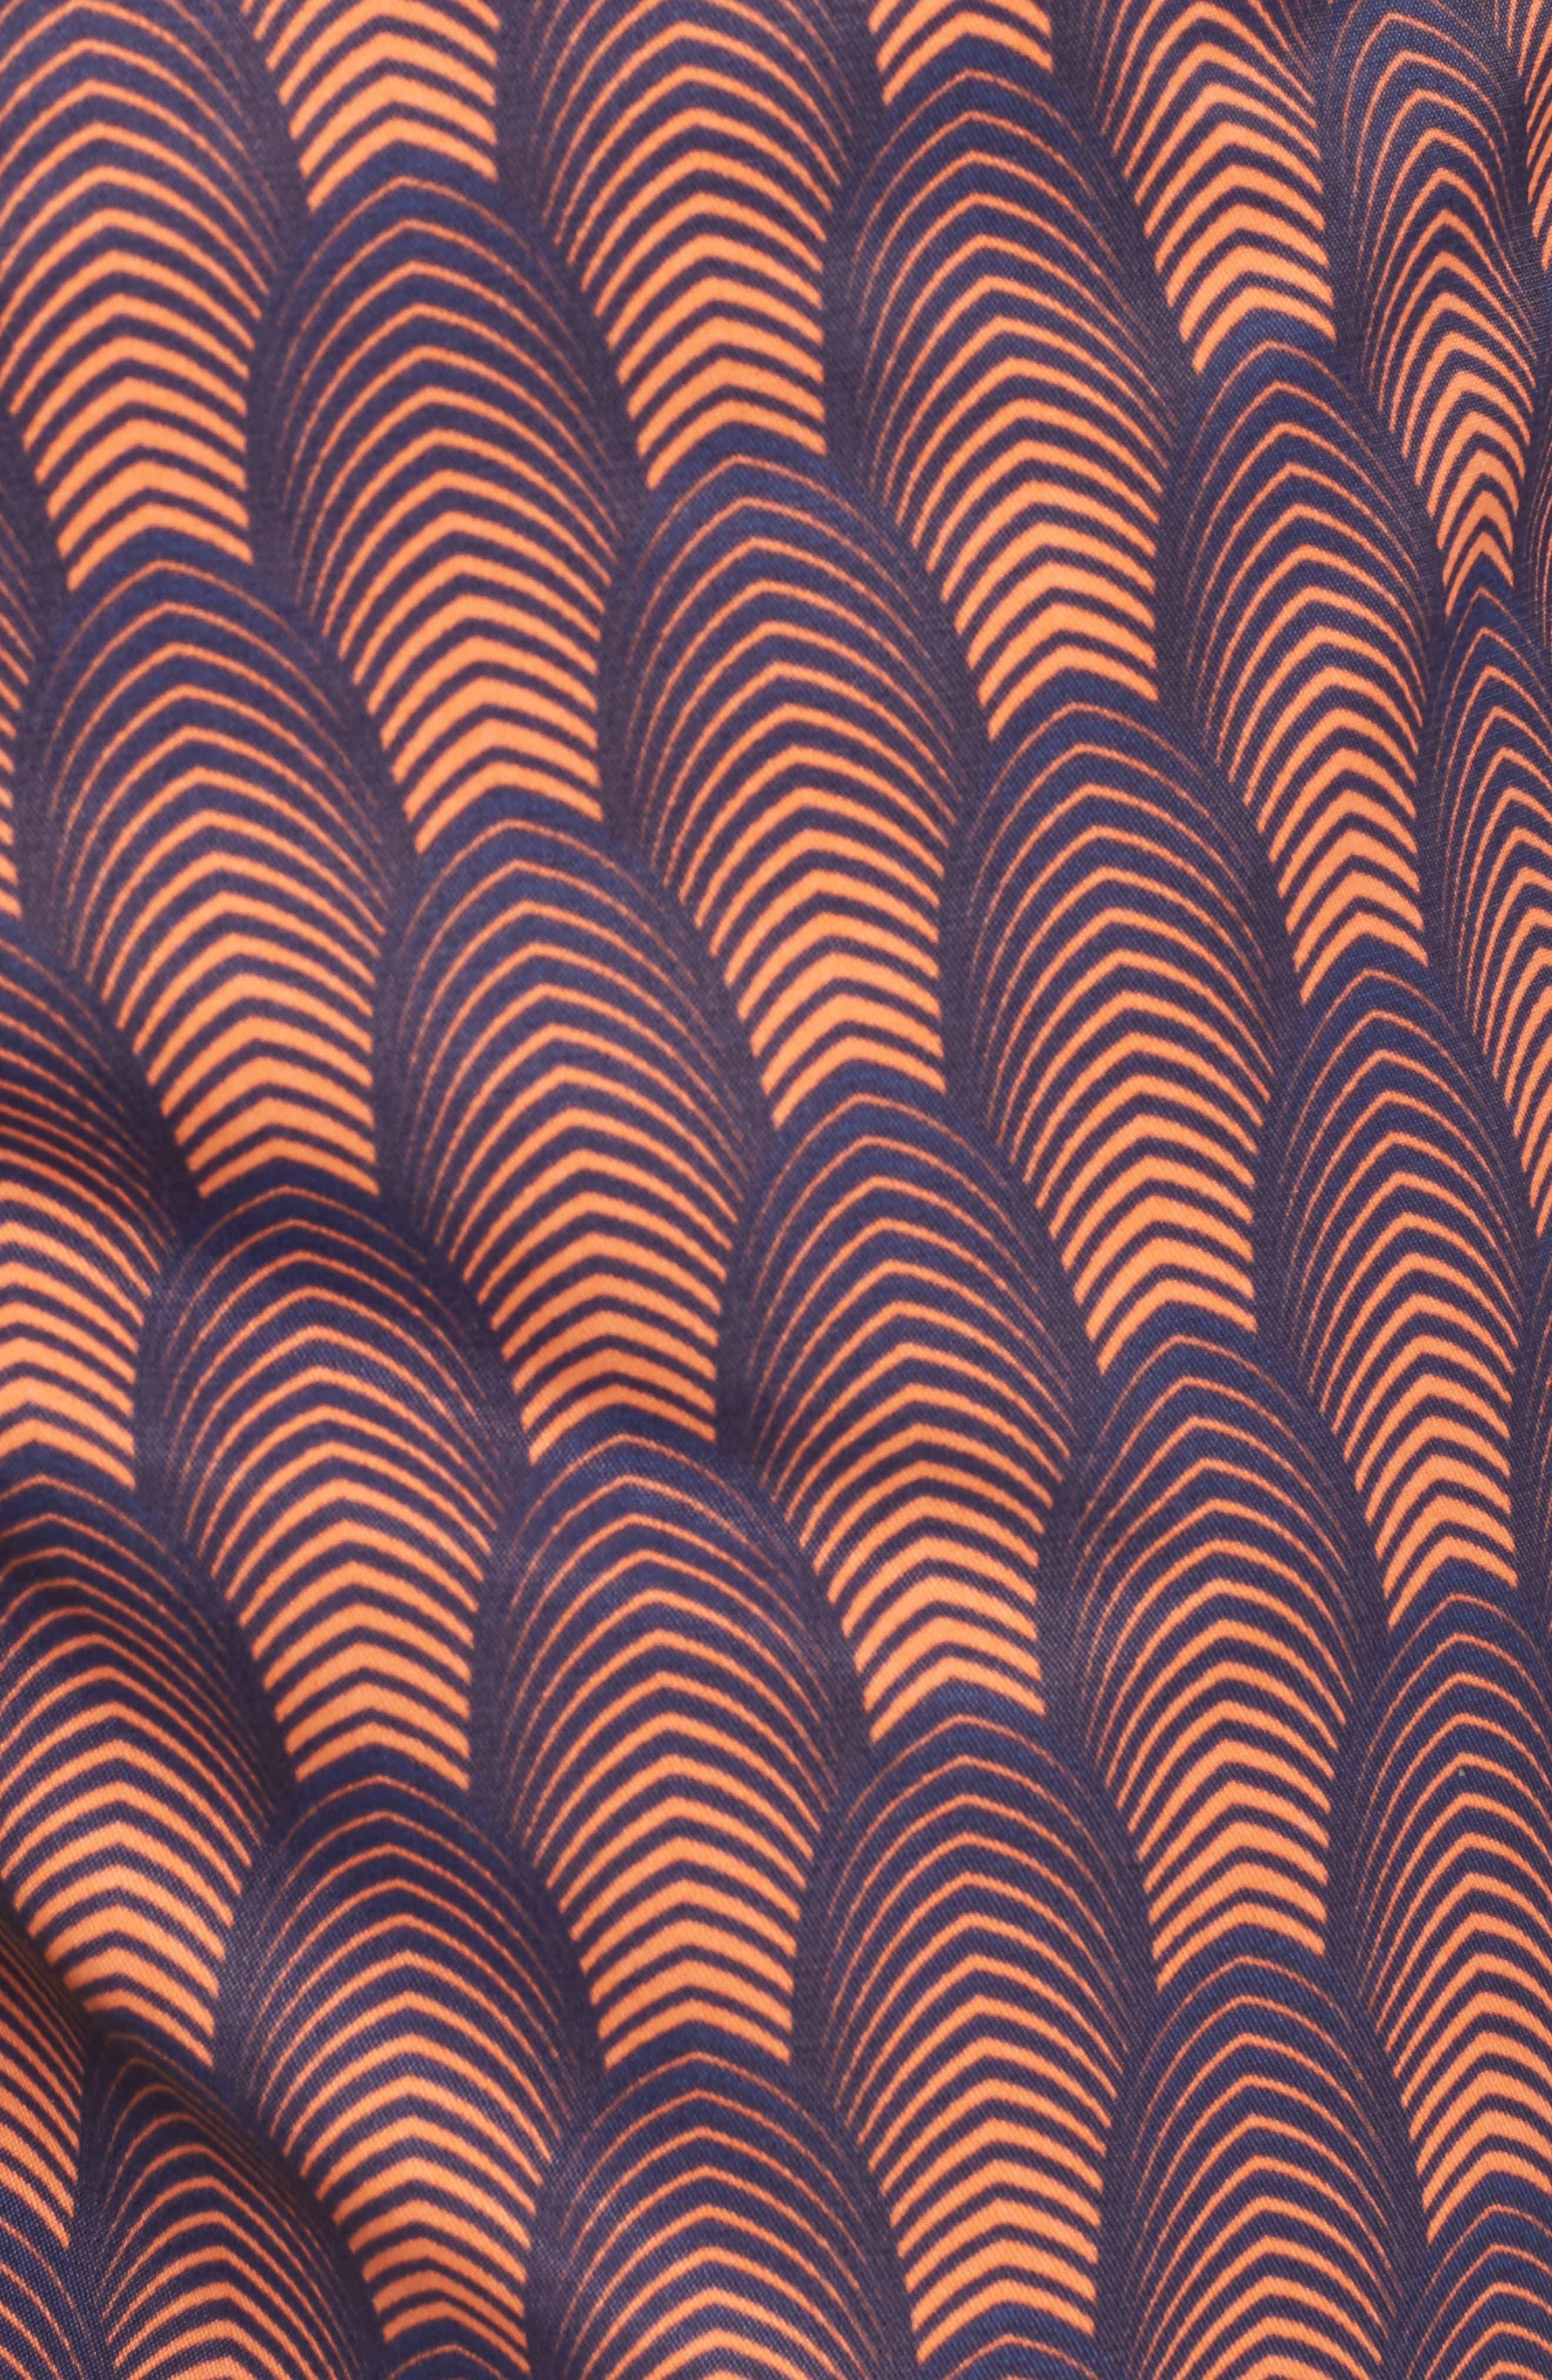 Mr. Swim Deco Print Swim Trunks,                             Alternate thumbnail 8, color,